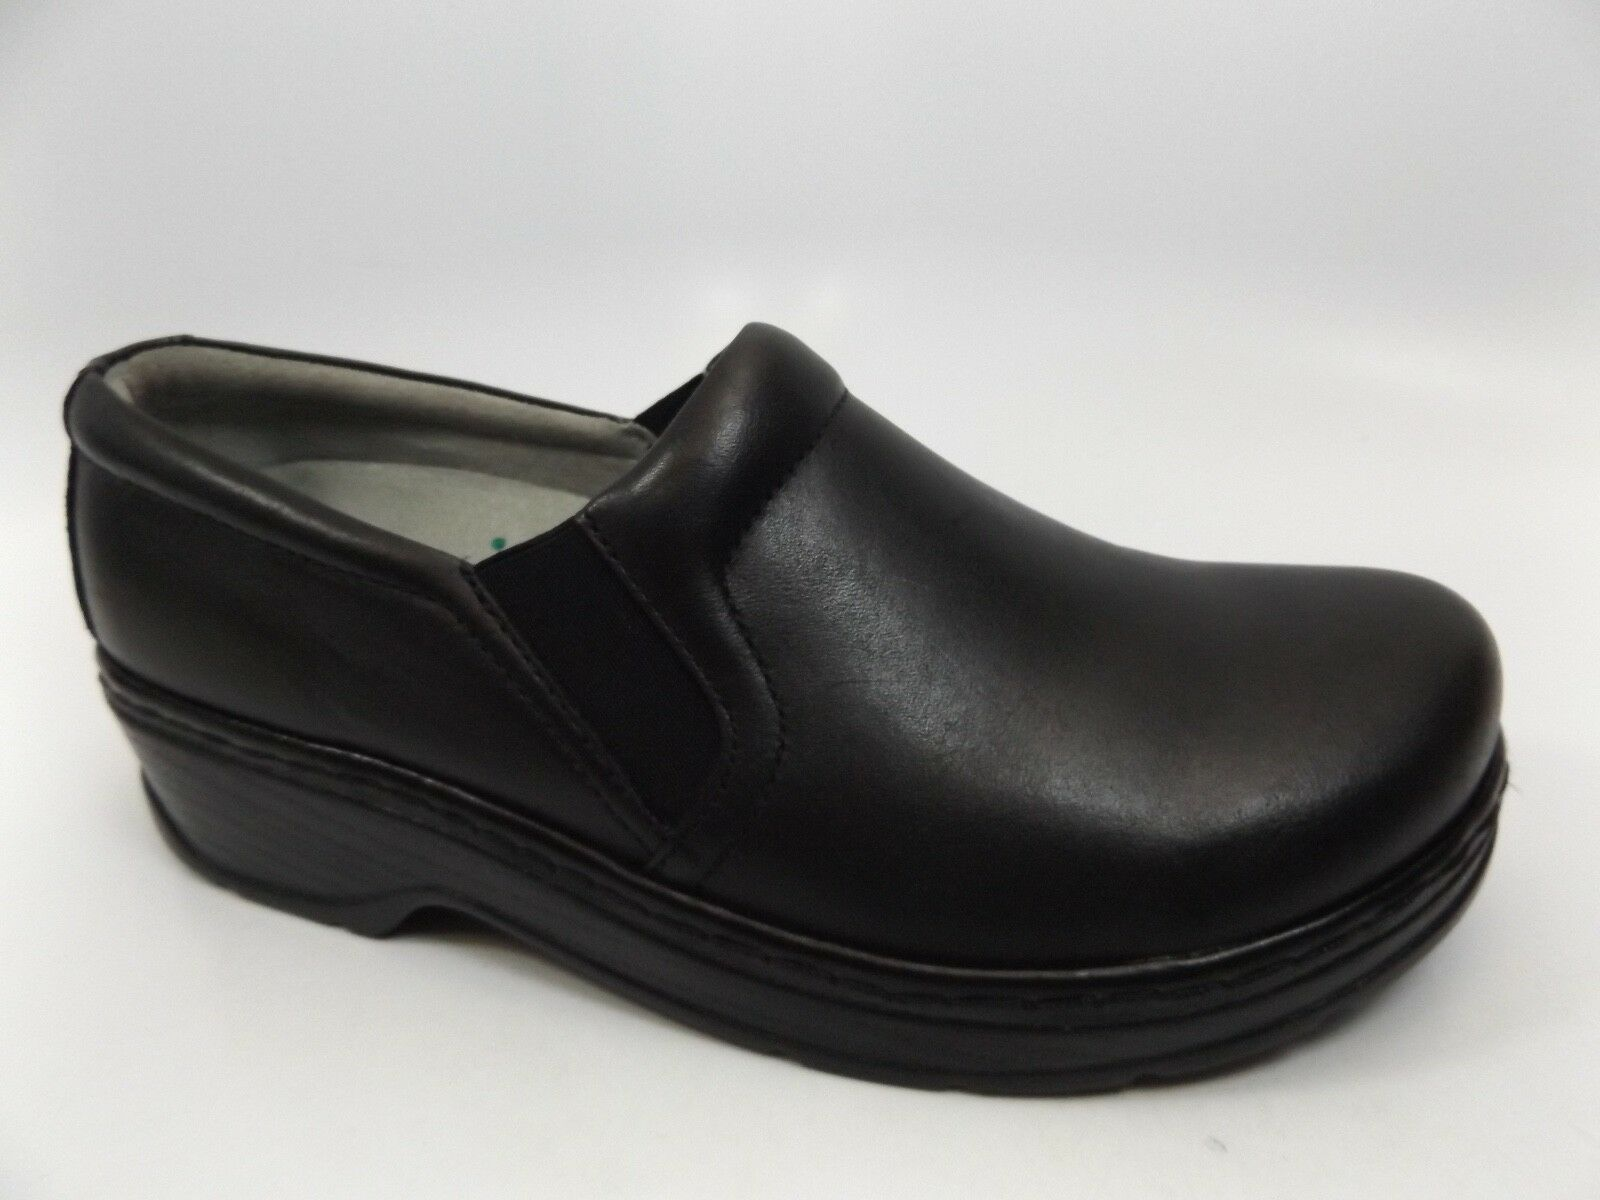 KLOGS FOOTWEAR NAPLES CLOGS BLACK LEATHER WOMEN'S SZ 11.0 WIDE PRE OWNED D7722